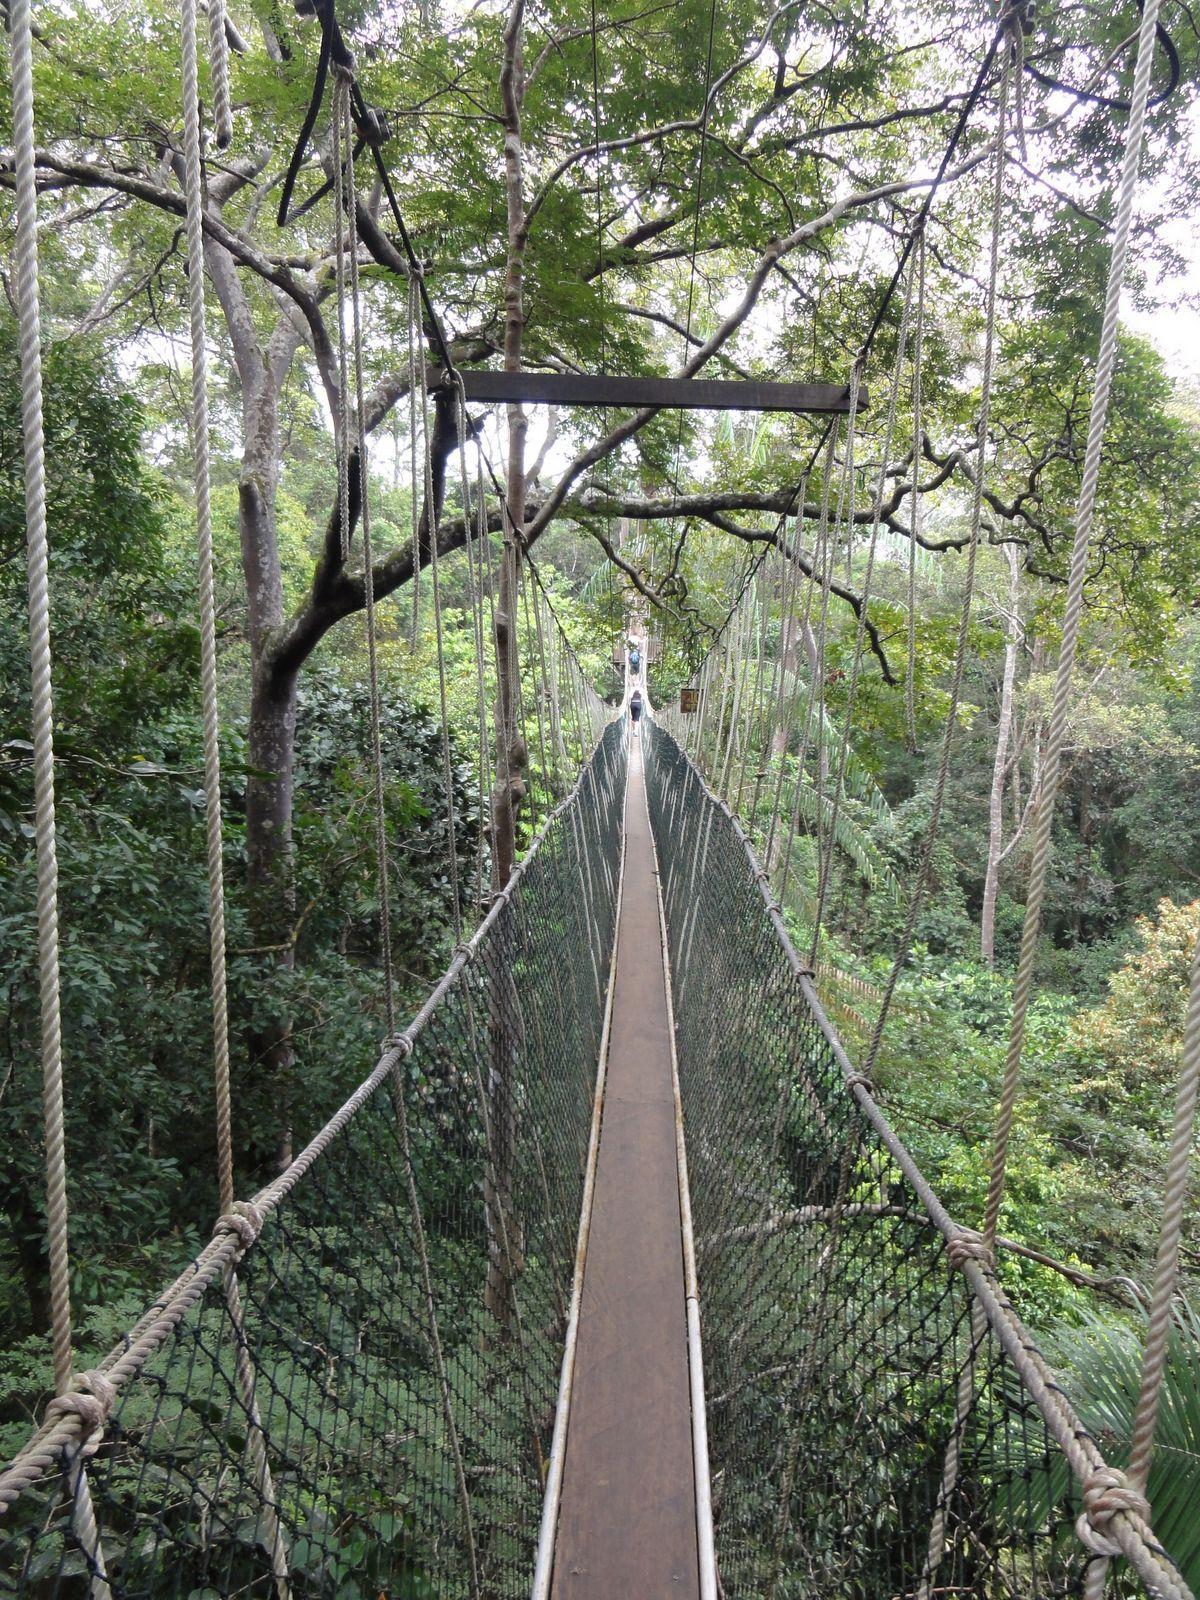 Taman Negara Canopy Walkway Malaysia & Taman Negara Canopy Walkway Malaysia | Wonderful places ...